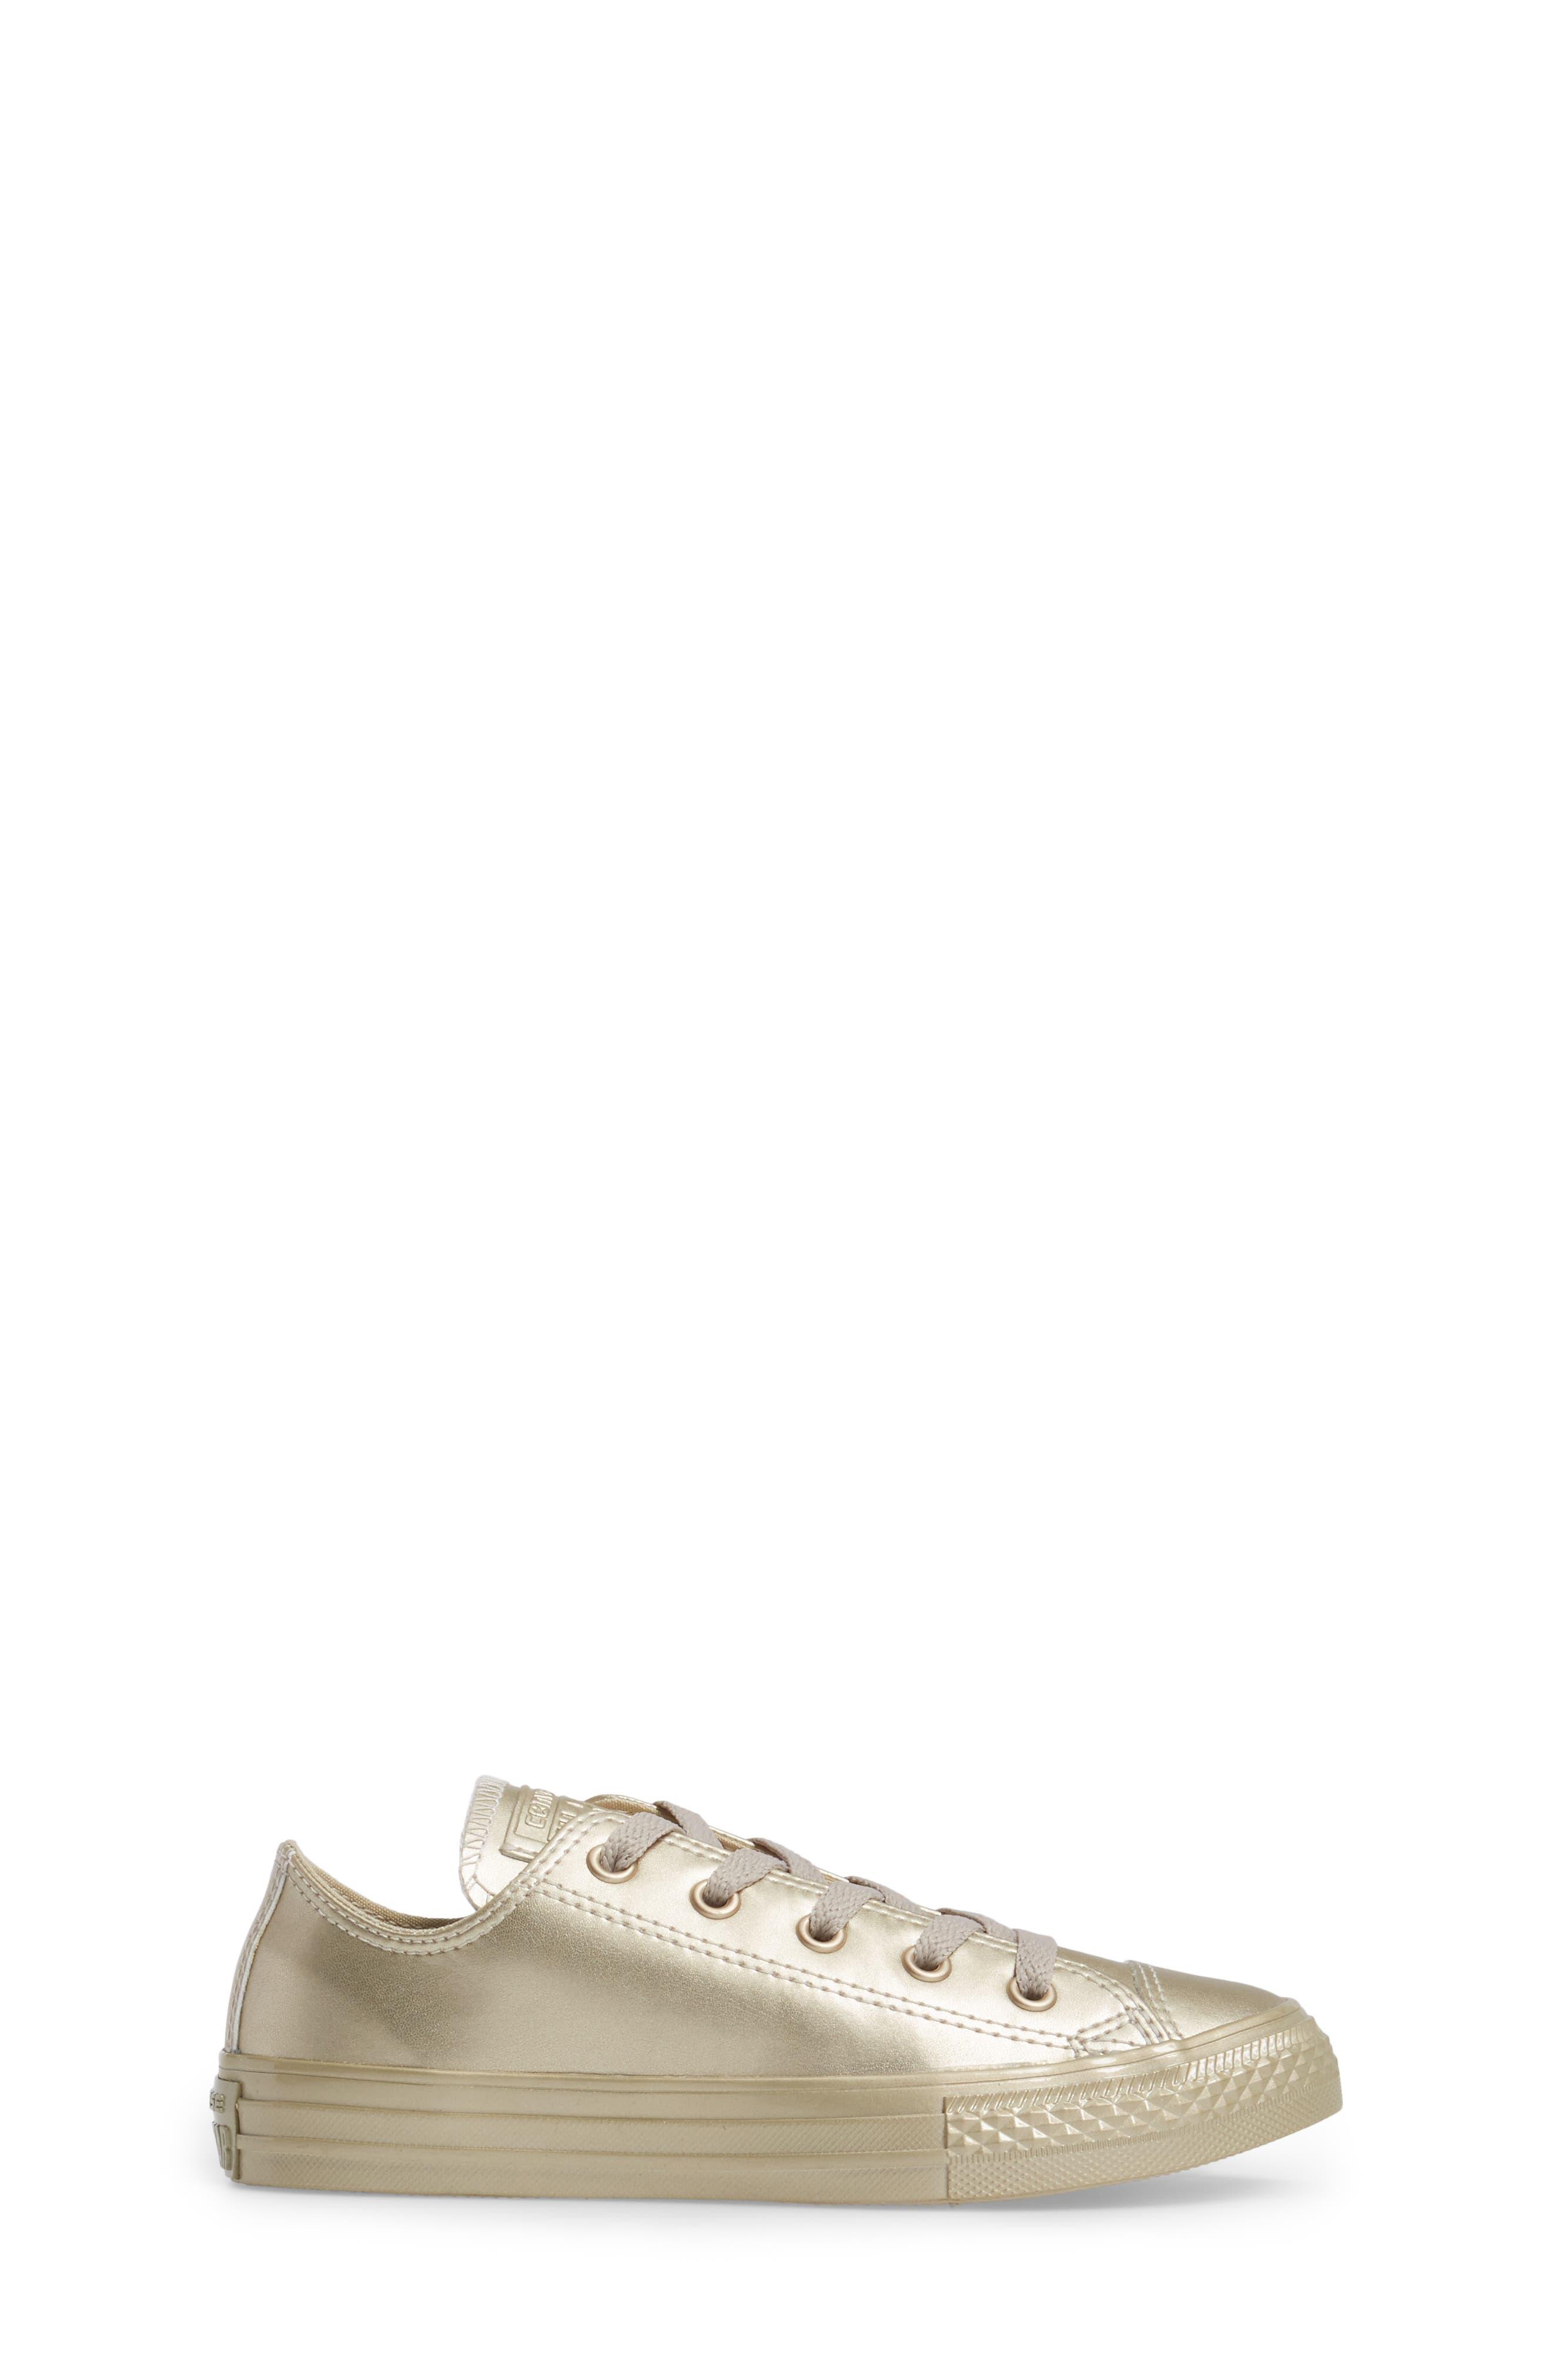 Alternate Image 3  - Converse Chuck Taylor® All Star® Mono Metallic Low Top Sneaker (Toddler & Little Kid)